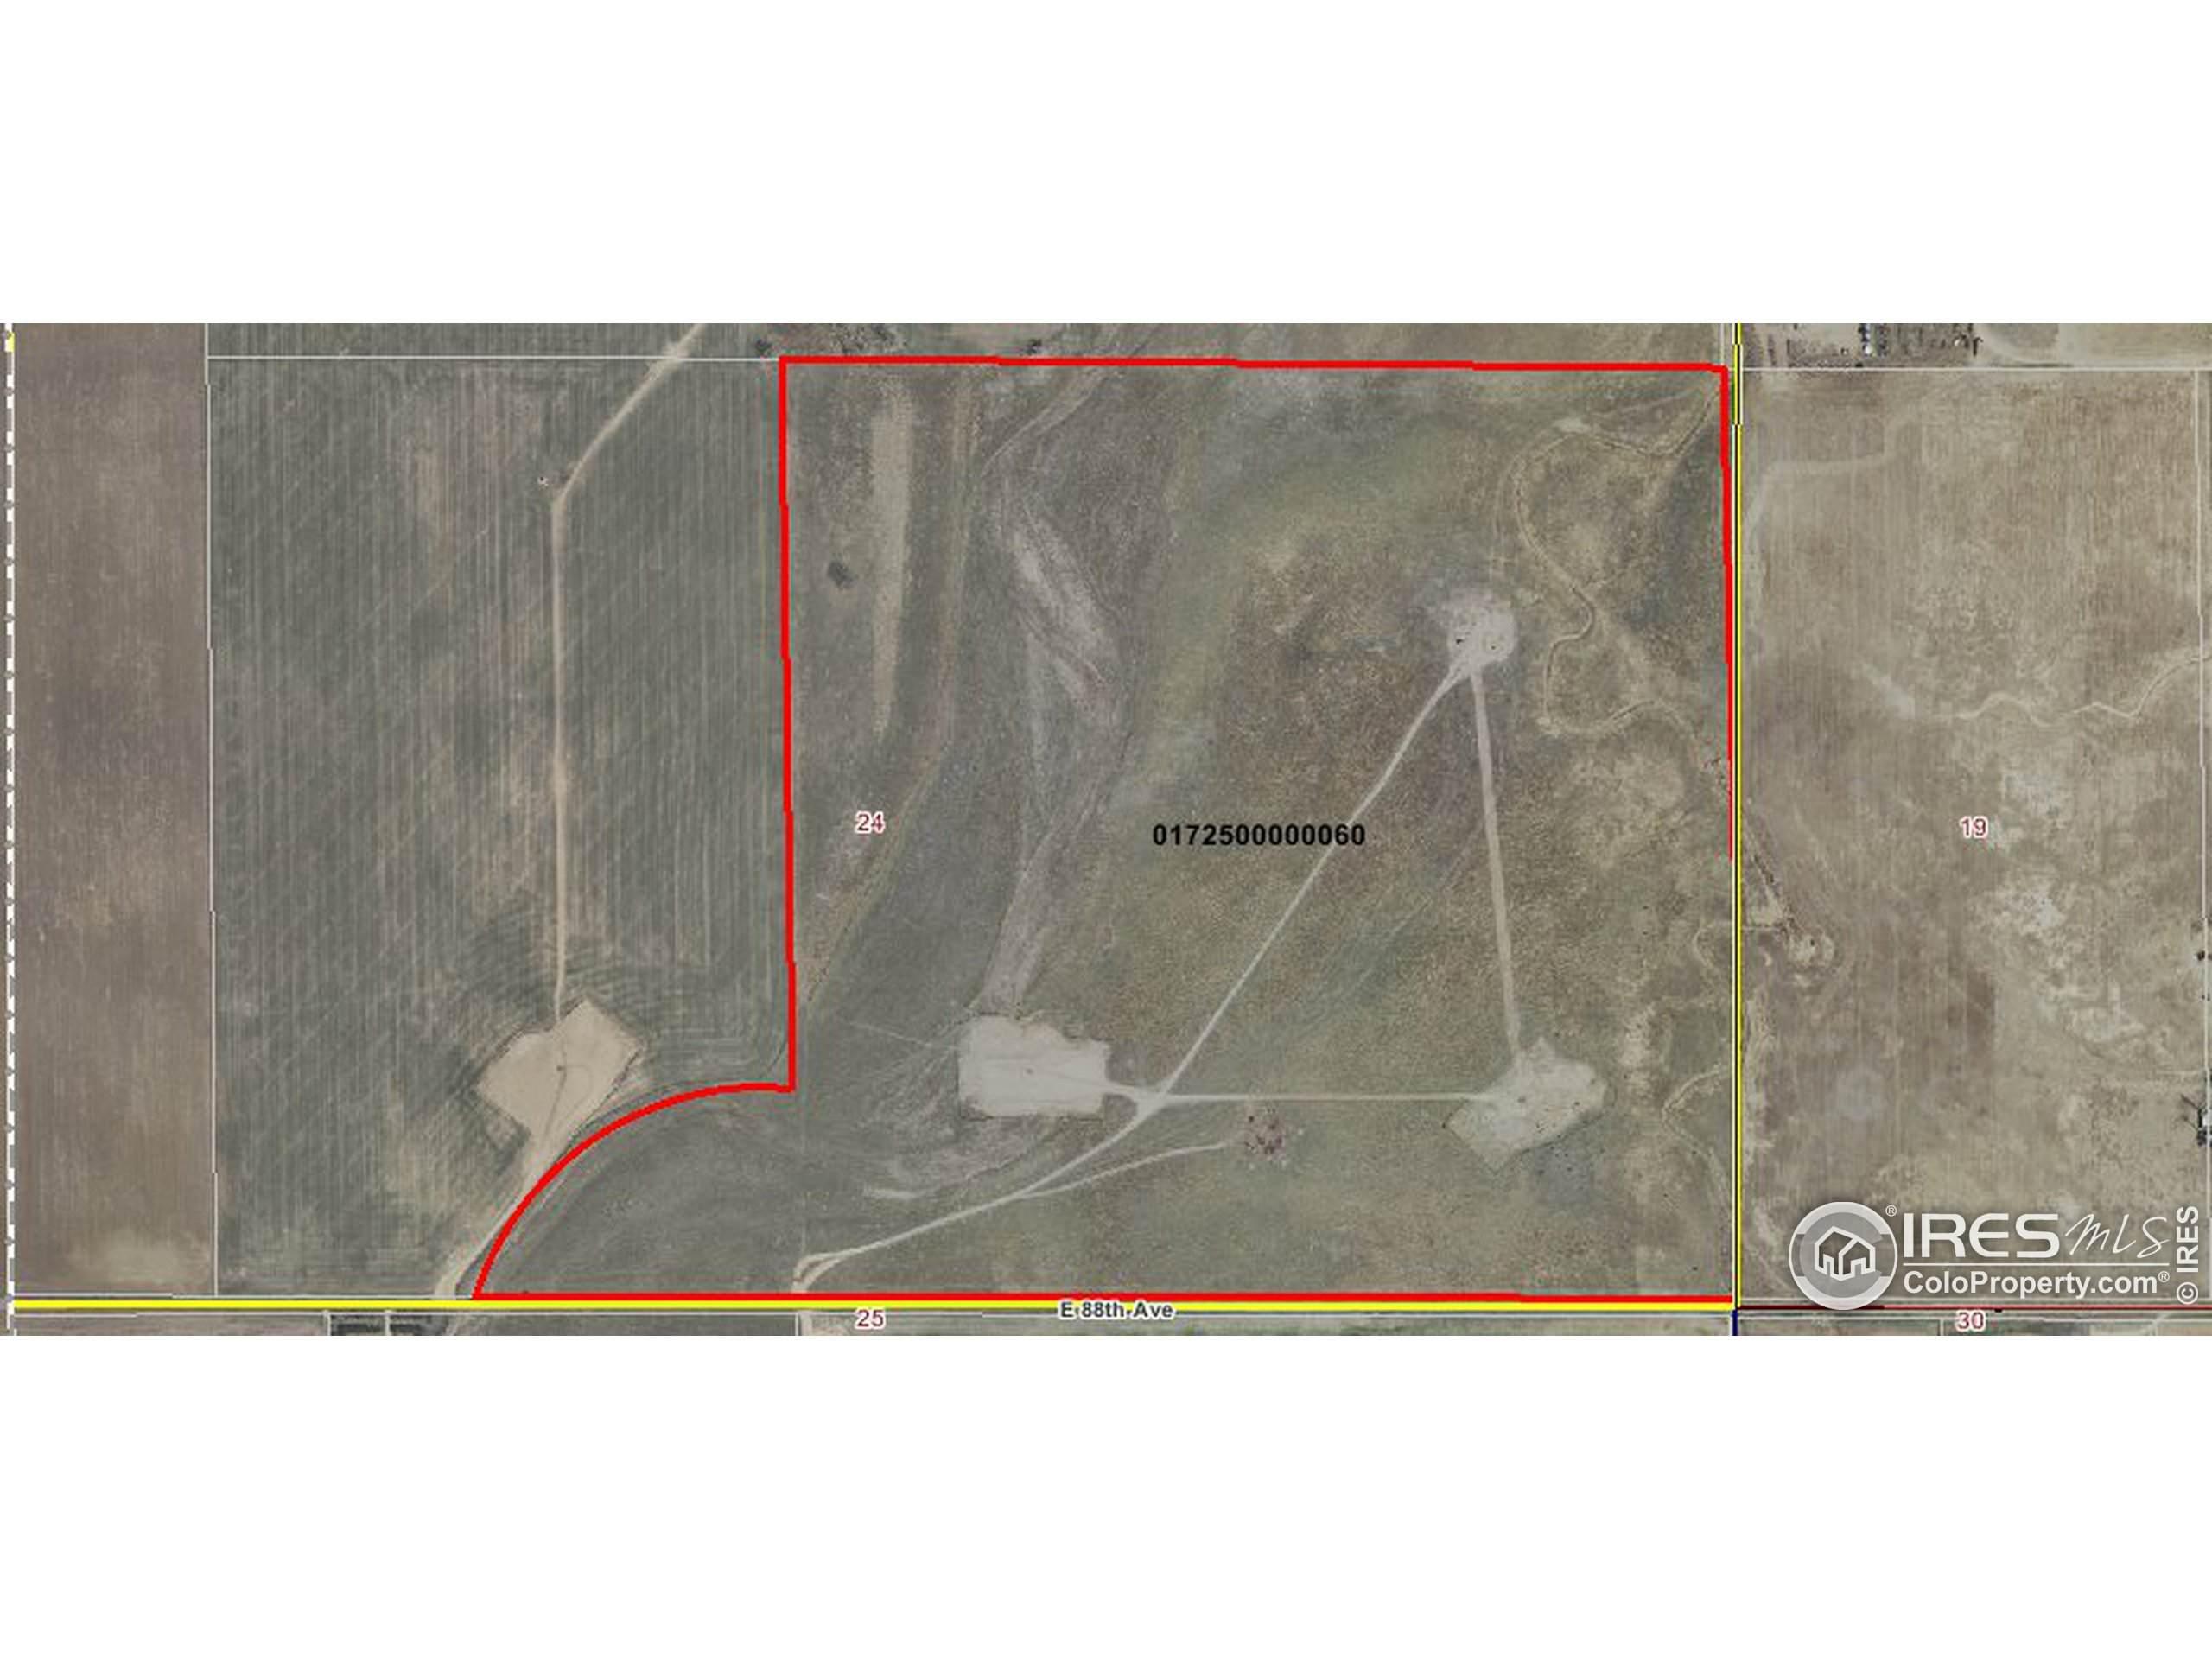 1235 Sherman St, Longmont, CO 80501 (MLS #939738) :: J2 Real Estate Group at Remax Alliance